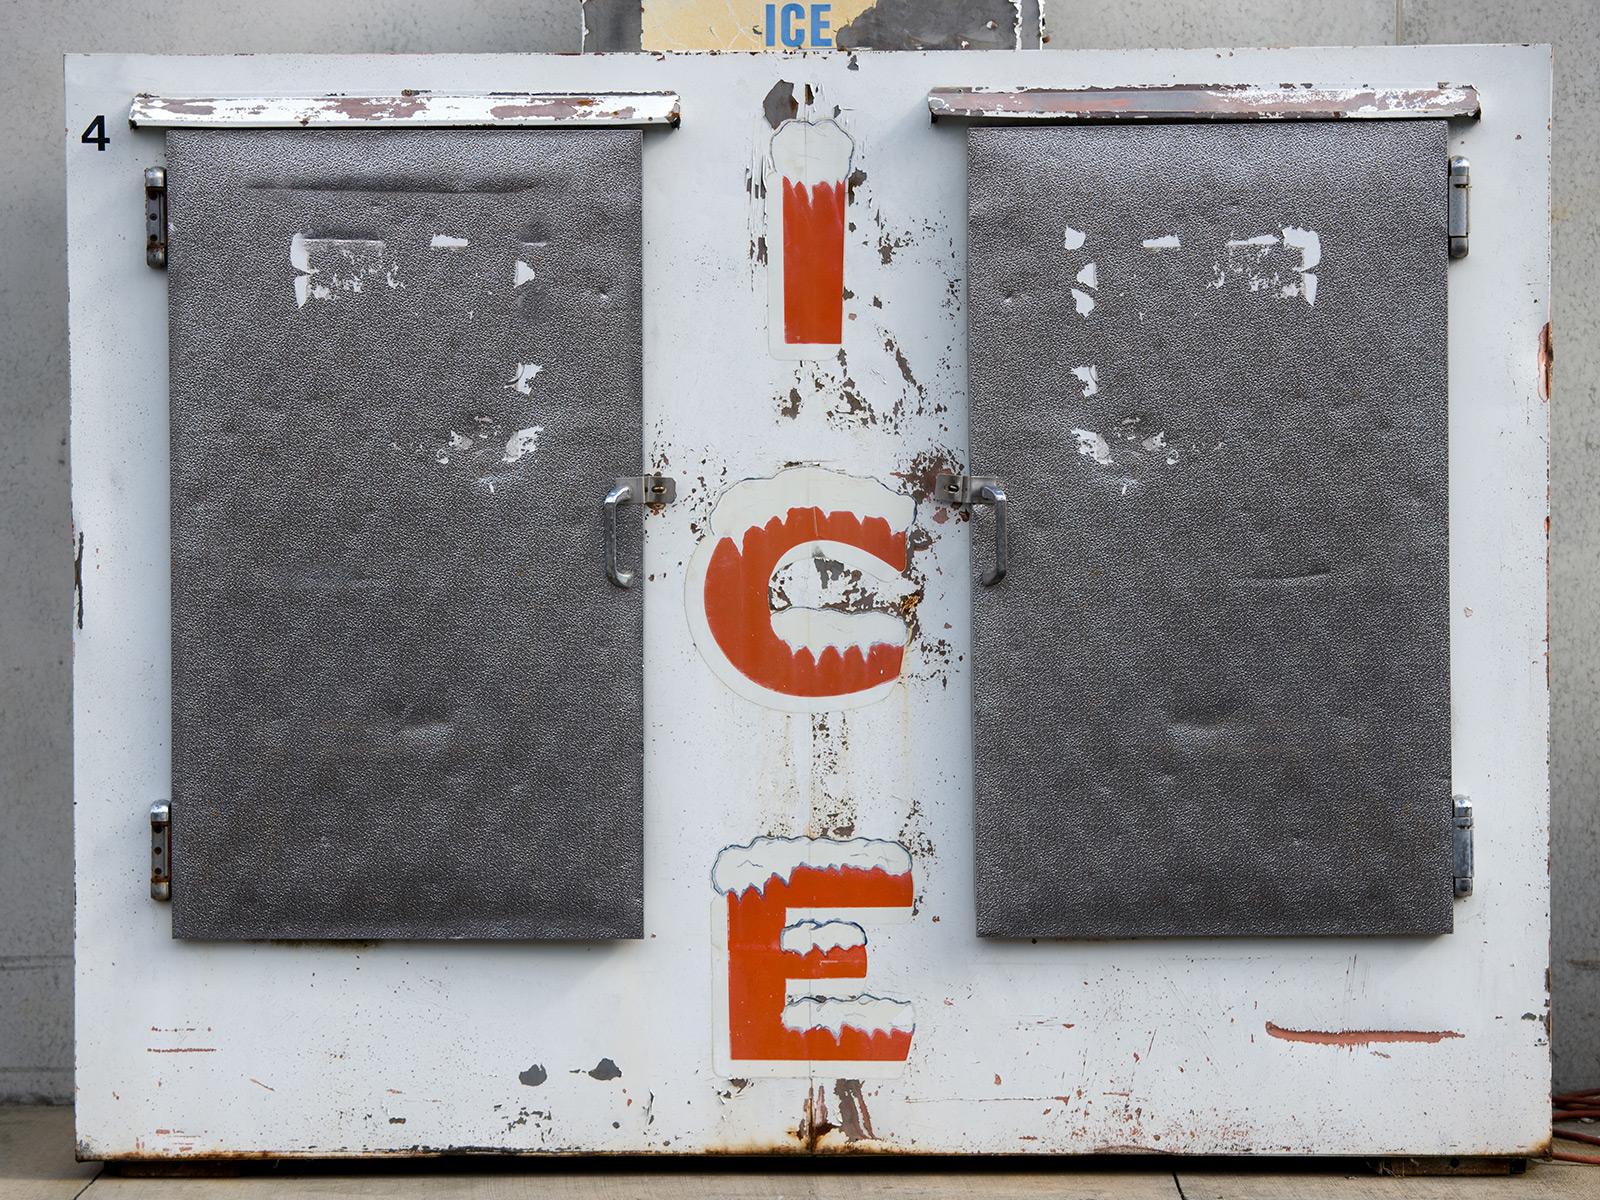 bag-ice.jpg